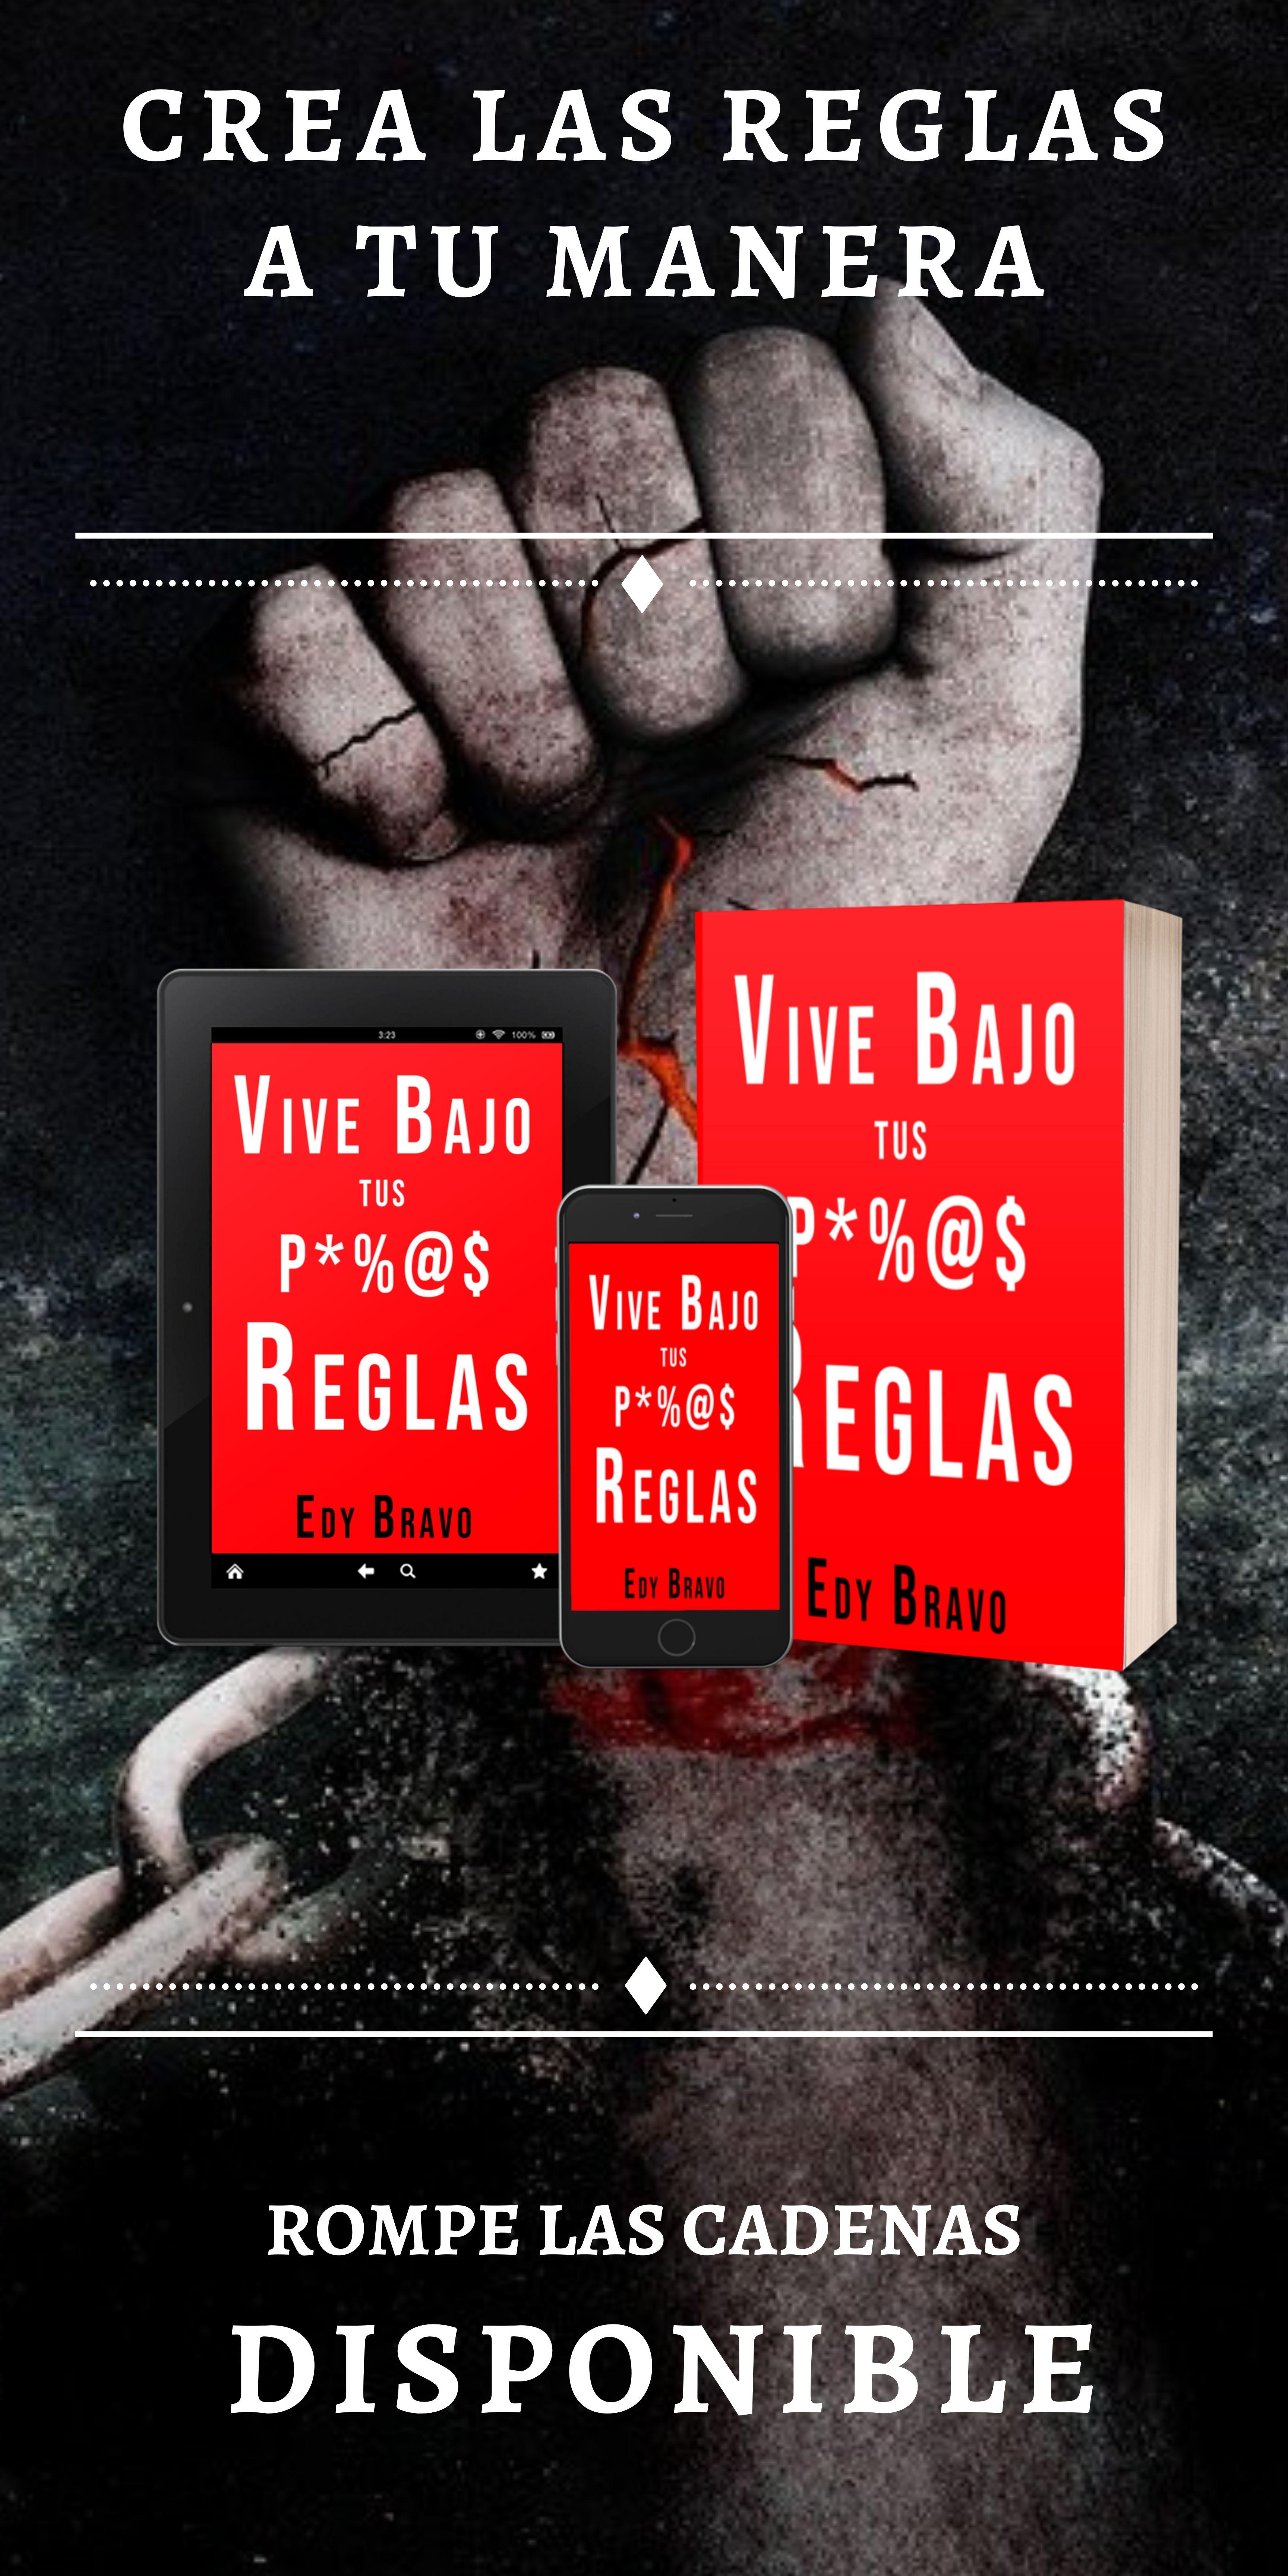 https://edybravo.com/wp-content/uploads/2021/05/vive-bajo-tus-propias-reglas-banner-scaled.jpg